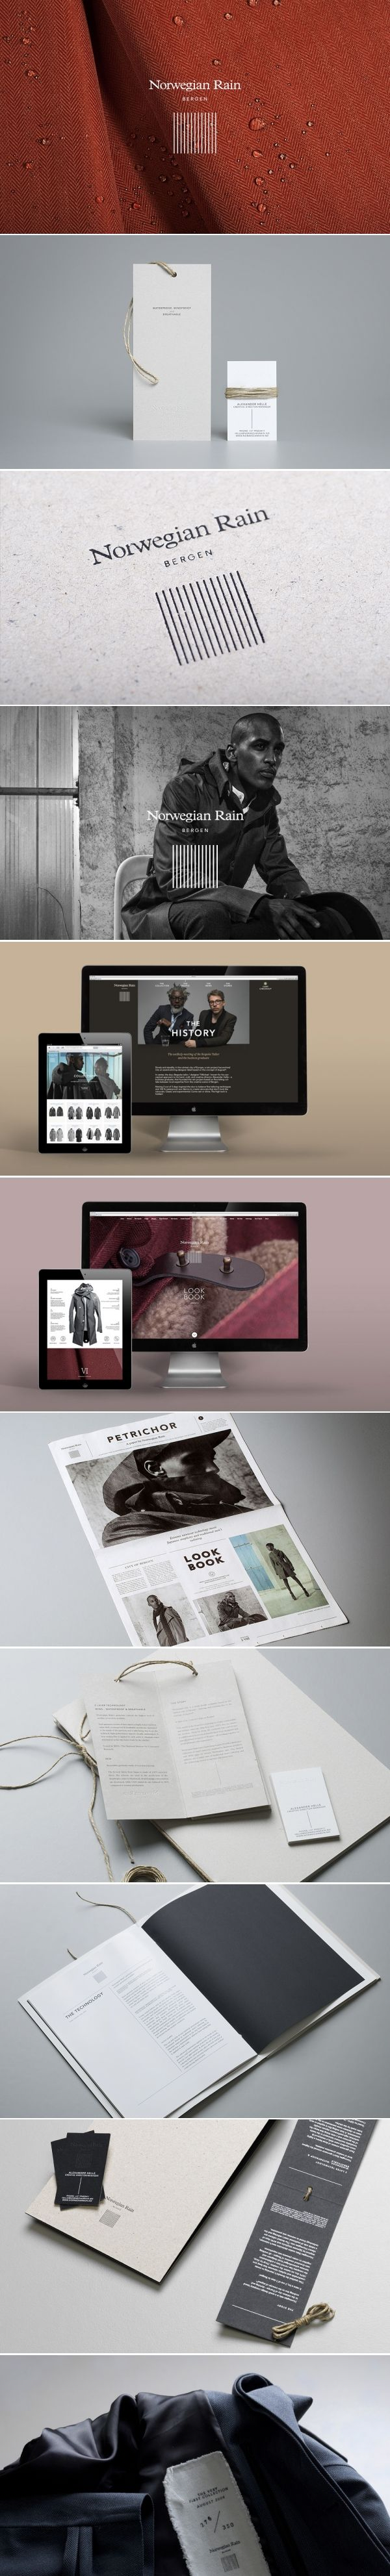 Cool Brand Identity Design. Norwegian Rain. #branding #brandidentity [http://www.pinterest.com/alfredchong/]